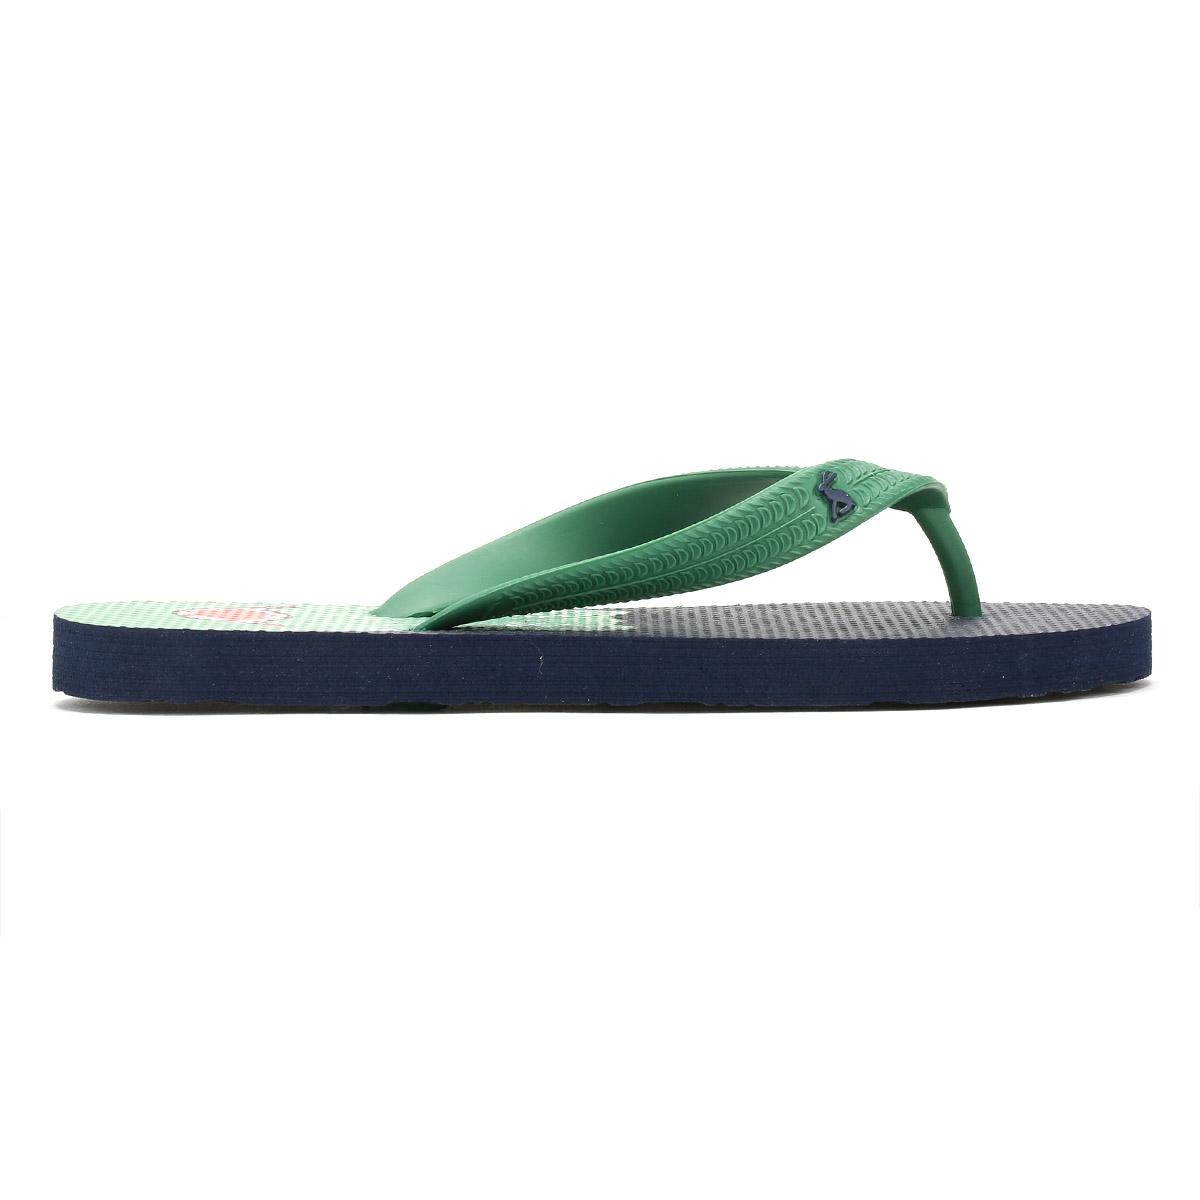 7dd8382dbe4ae Joules Junior Navy Blue Dino Printed Flip Flops Kids Summer Shoes Sandals